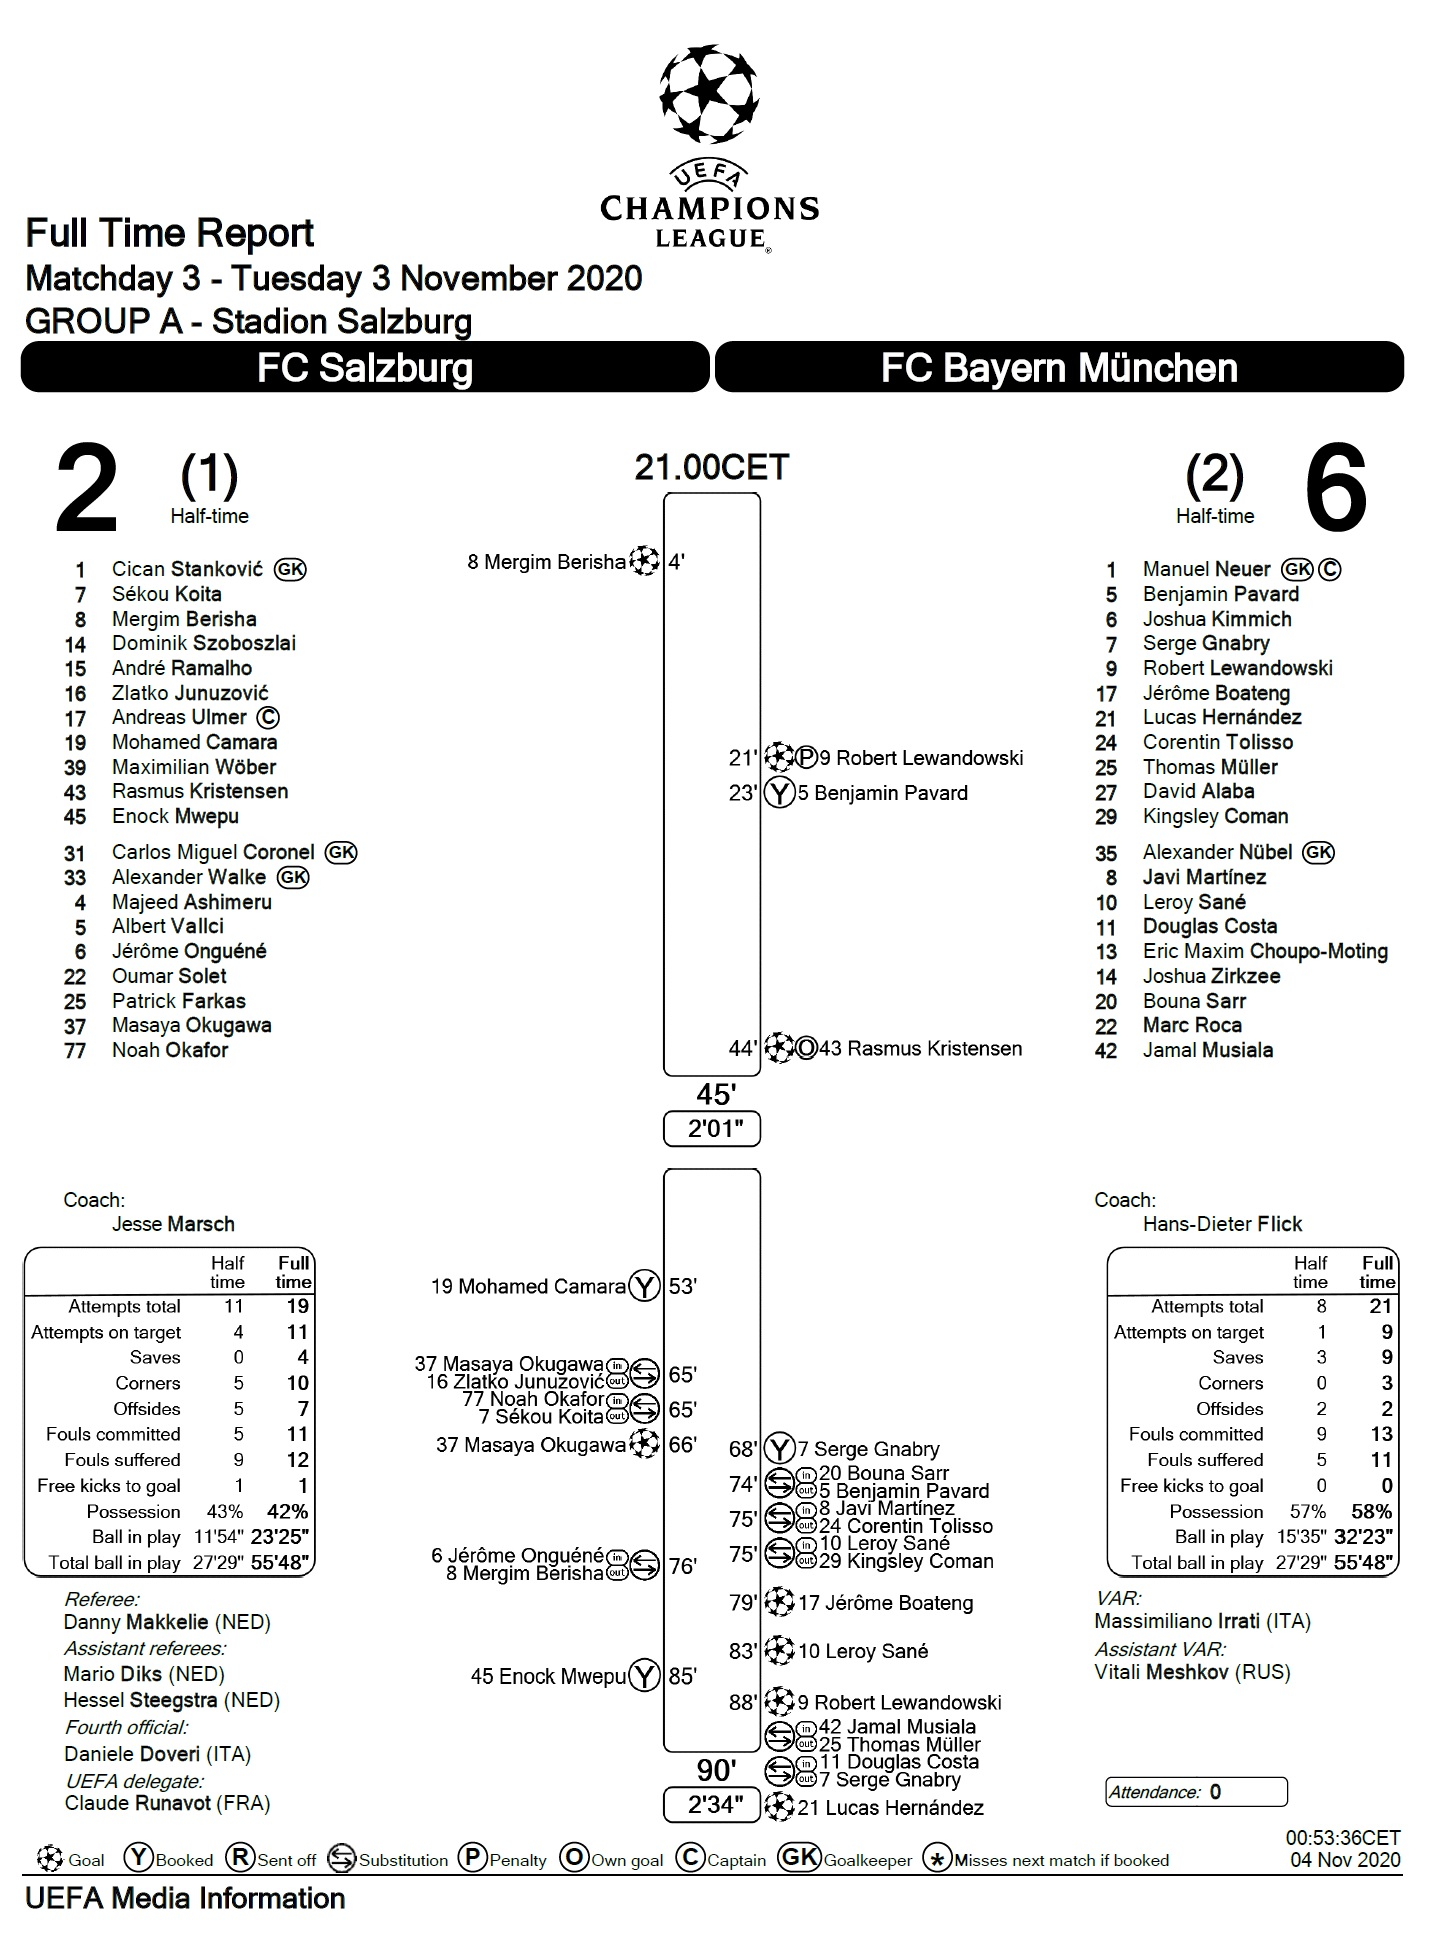 Зальцбург (Австрия) - Бавария (Германия) 2:6